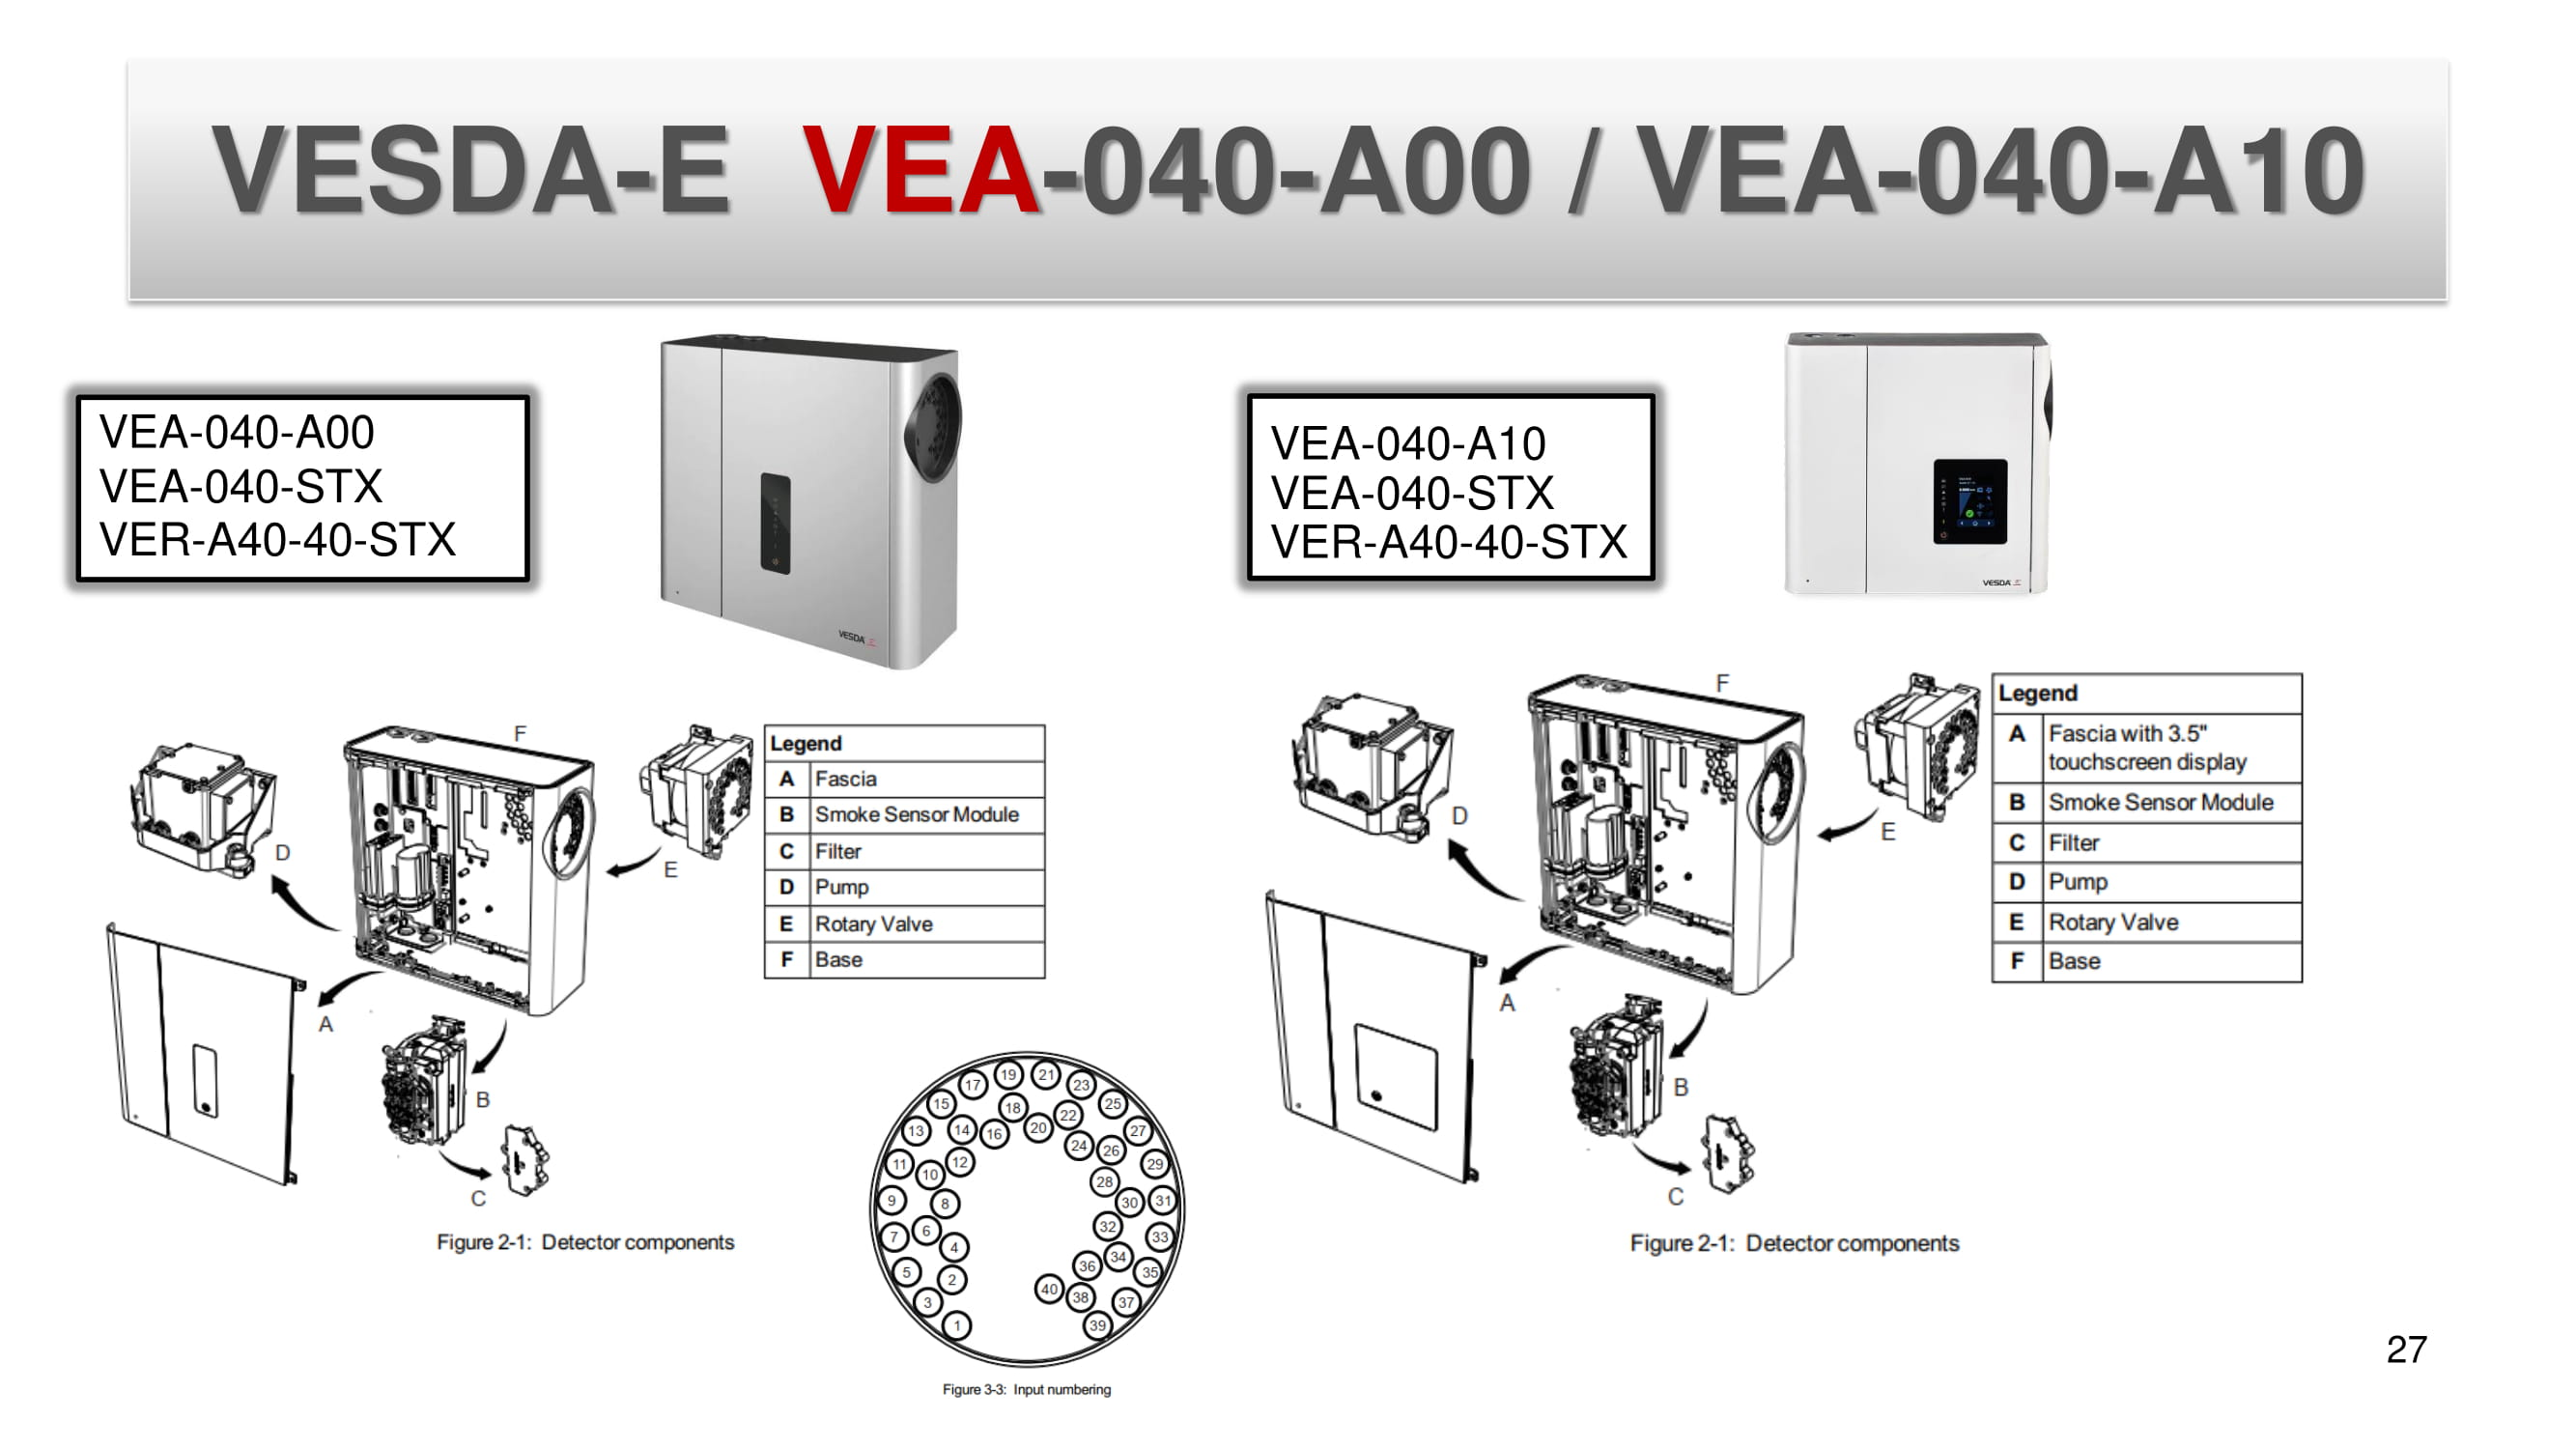 VESDA-E  VEA-040-A00